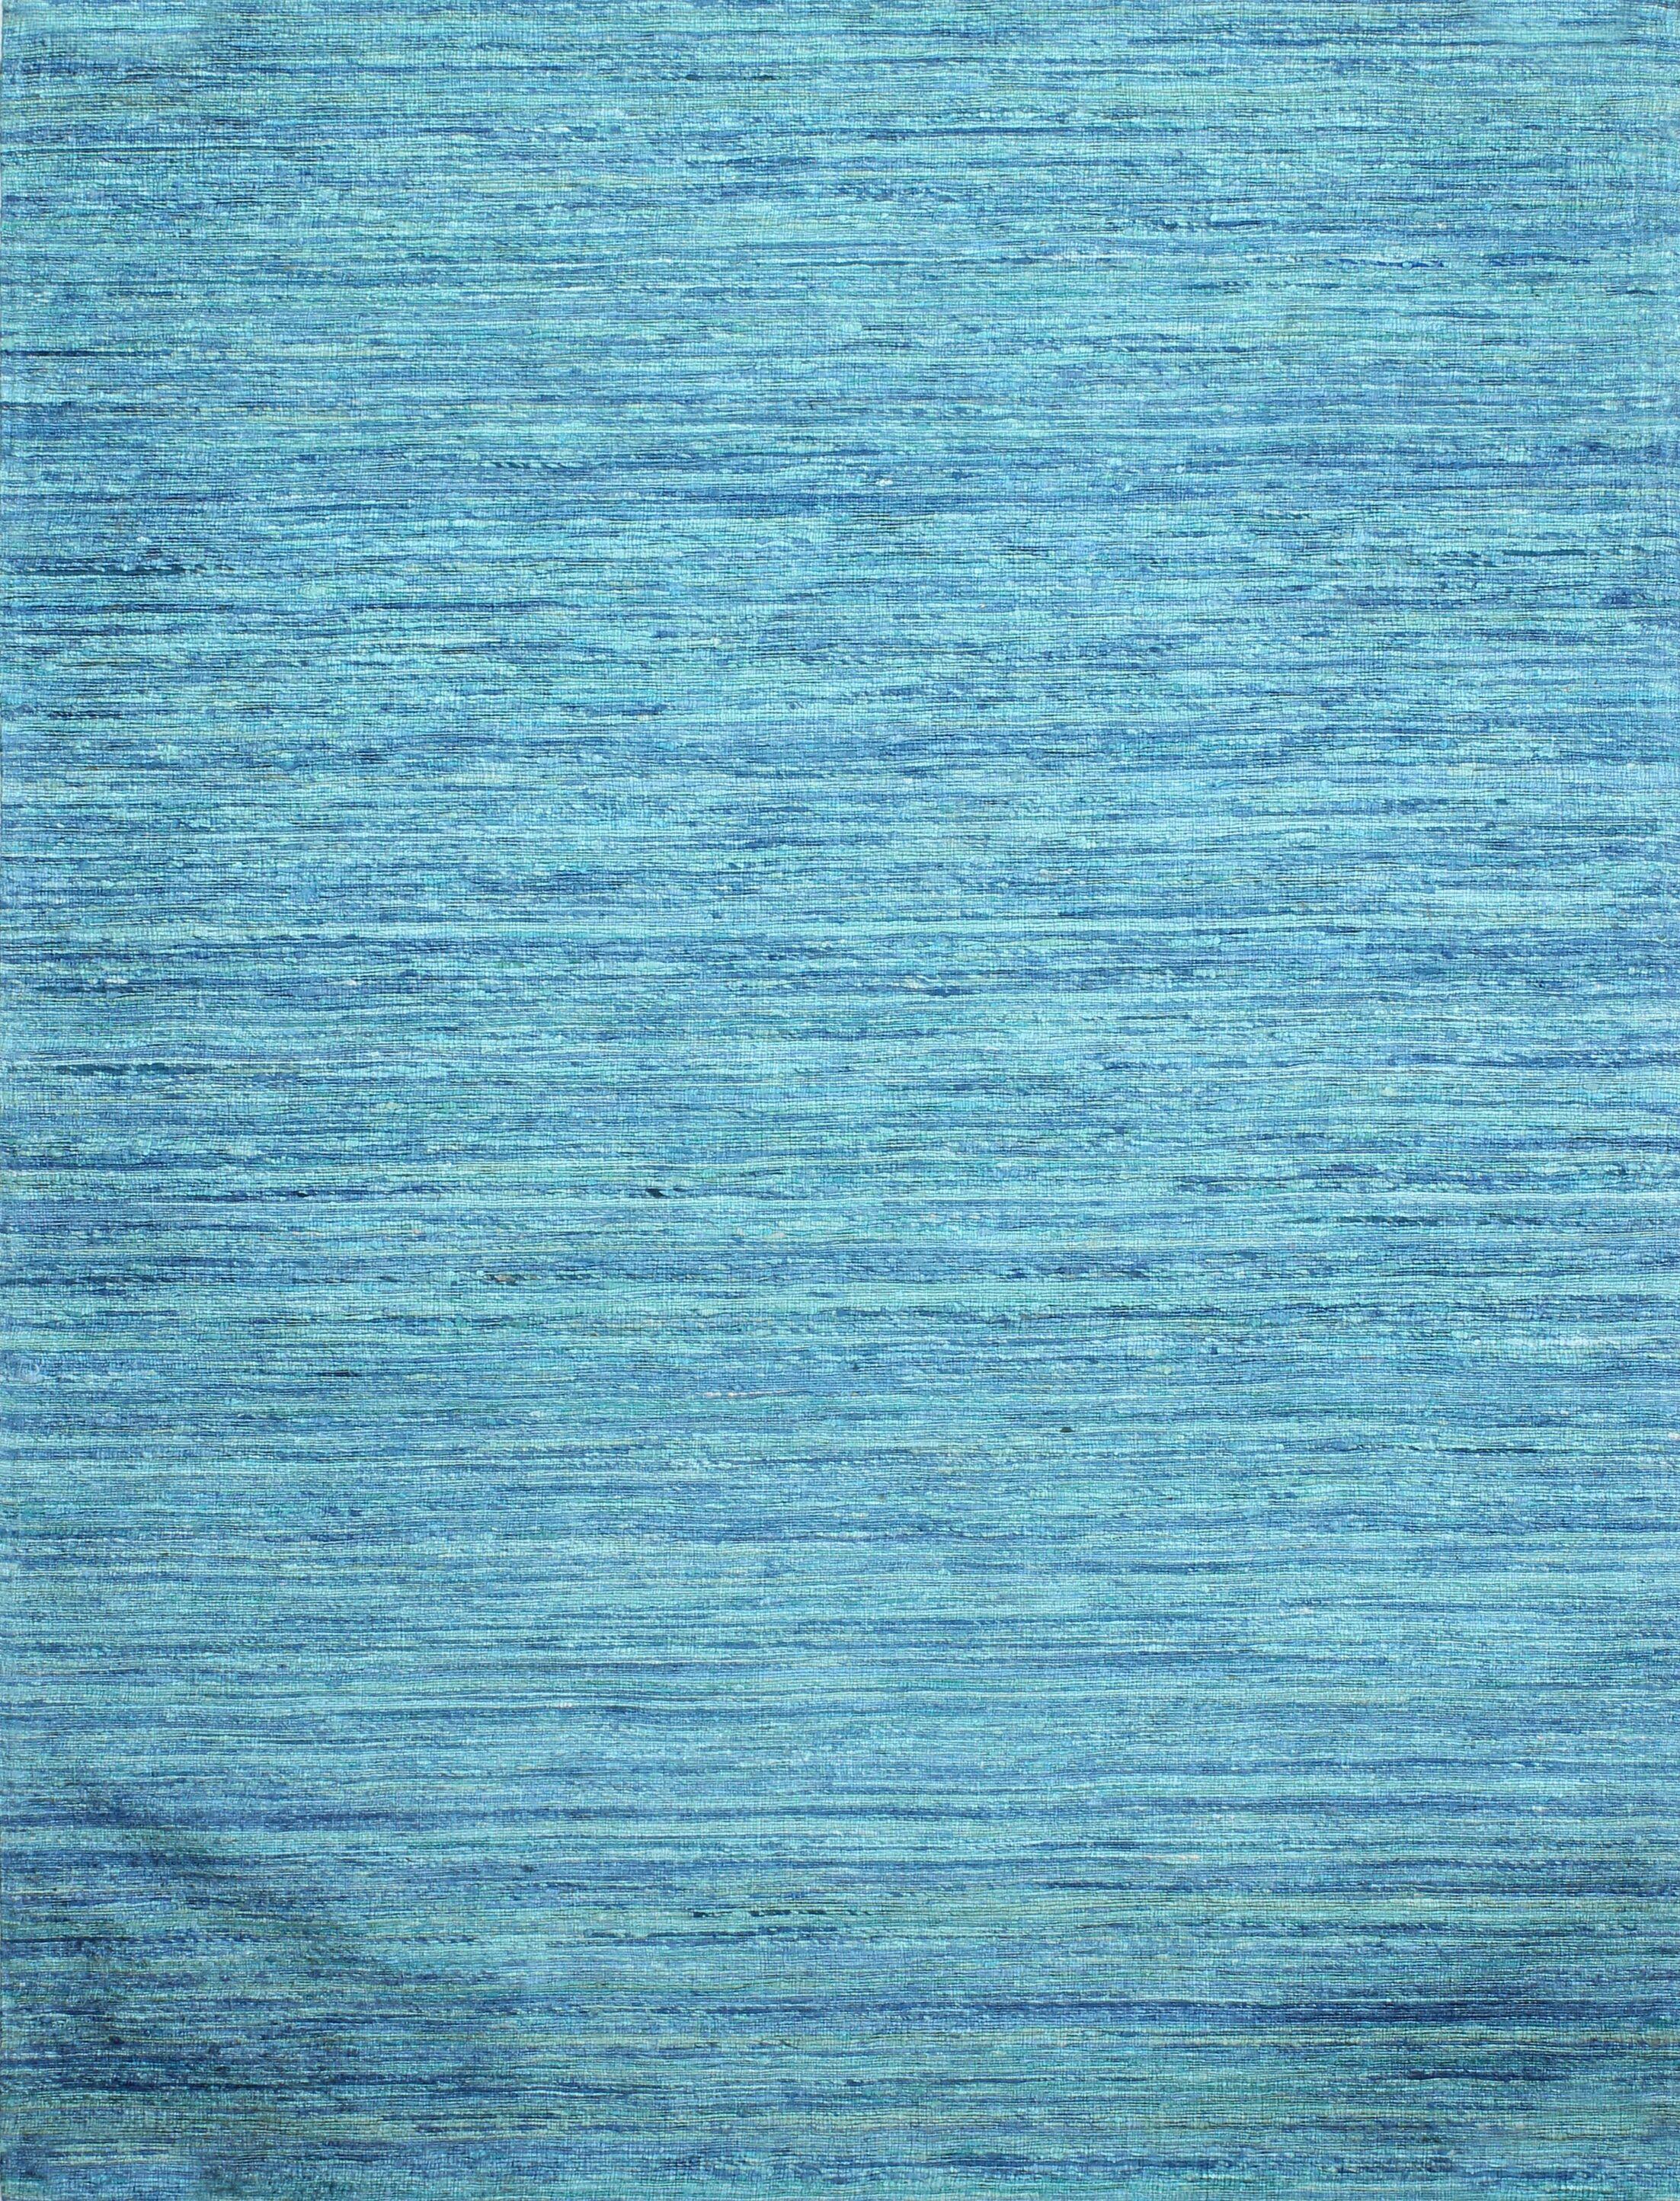 Fagan Hand Woven Blue Area Rug Rug Size: Rectangle 5' x 7'